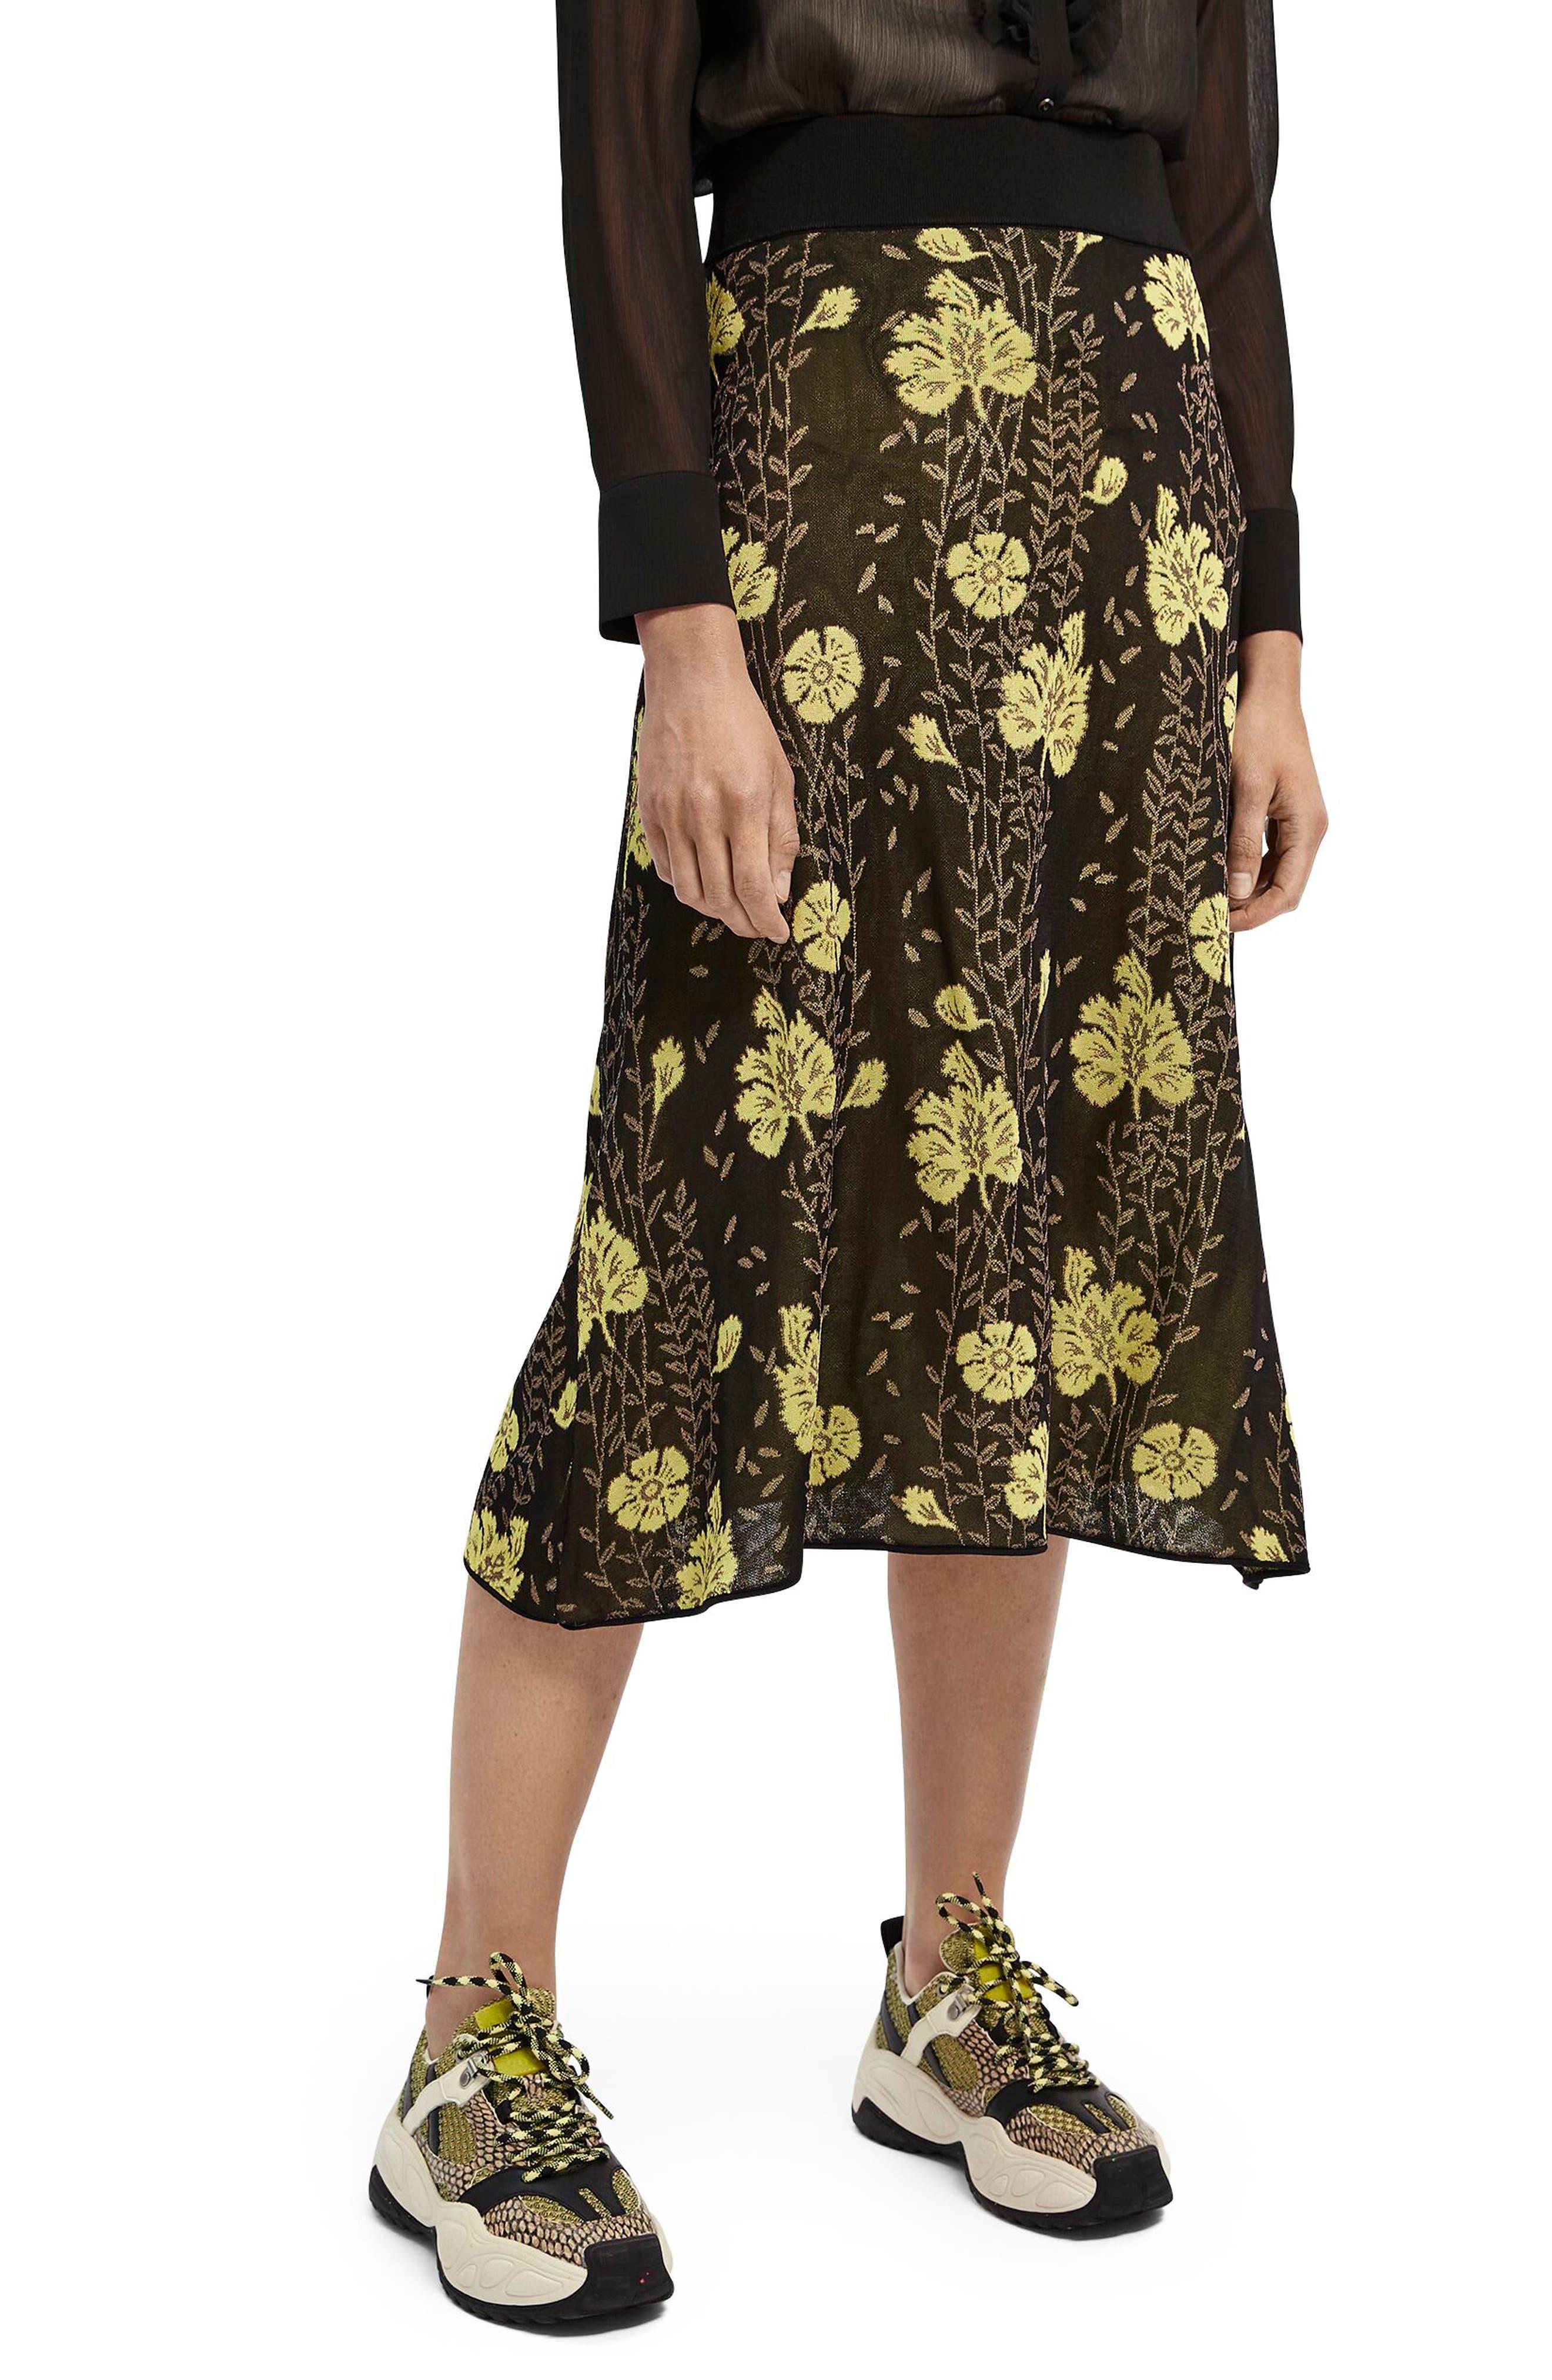 Scotch & Soda Women's Scotch & Soda Floral Knit Skirt, Size X-Large - Black